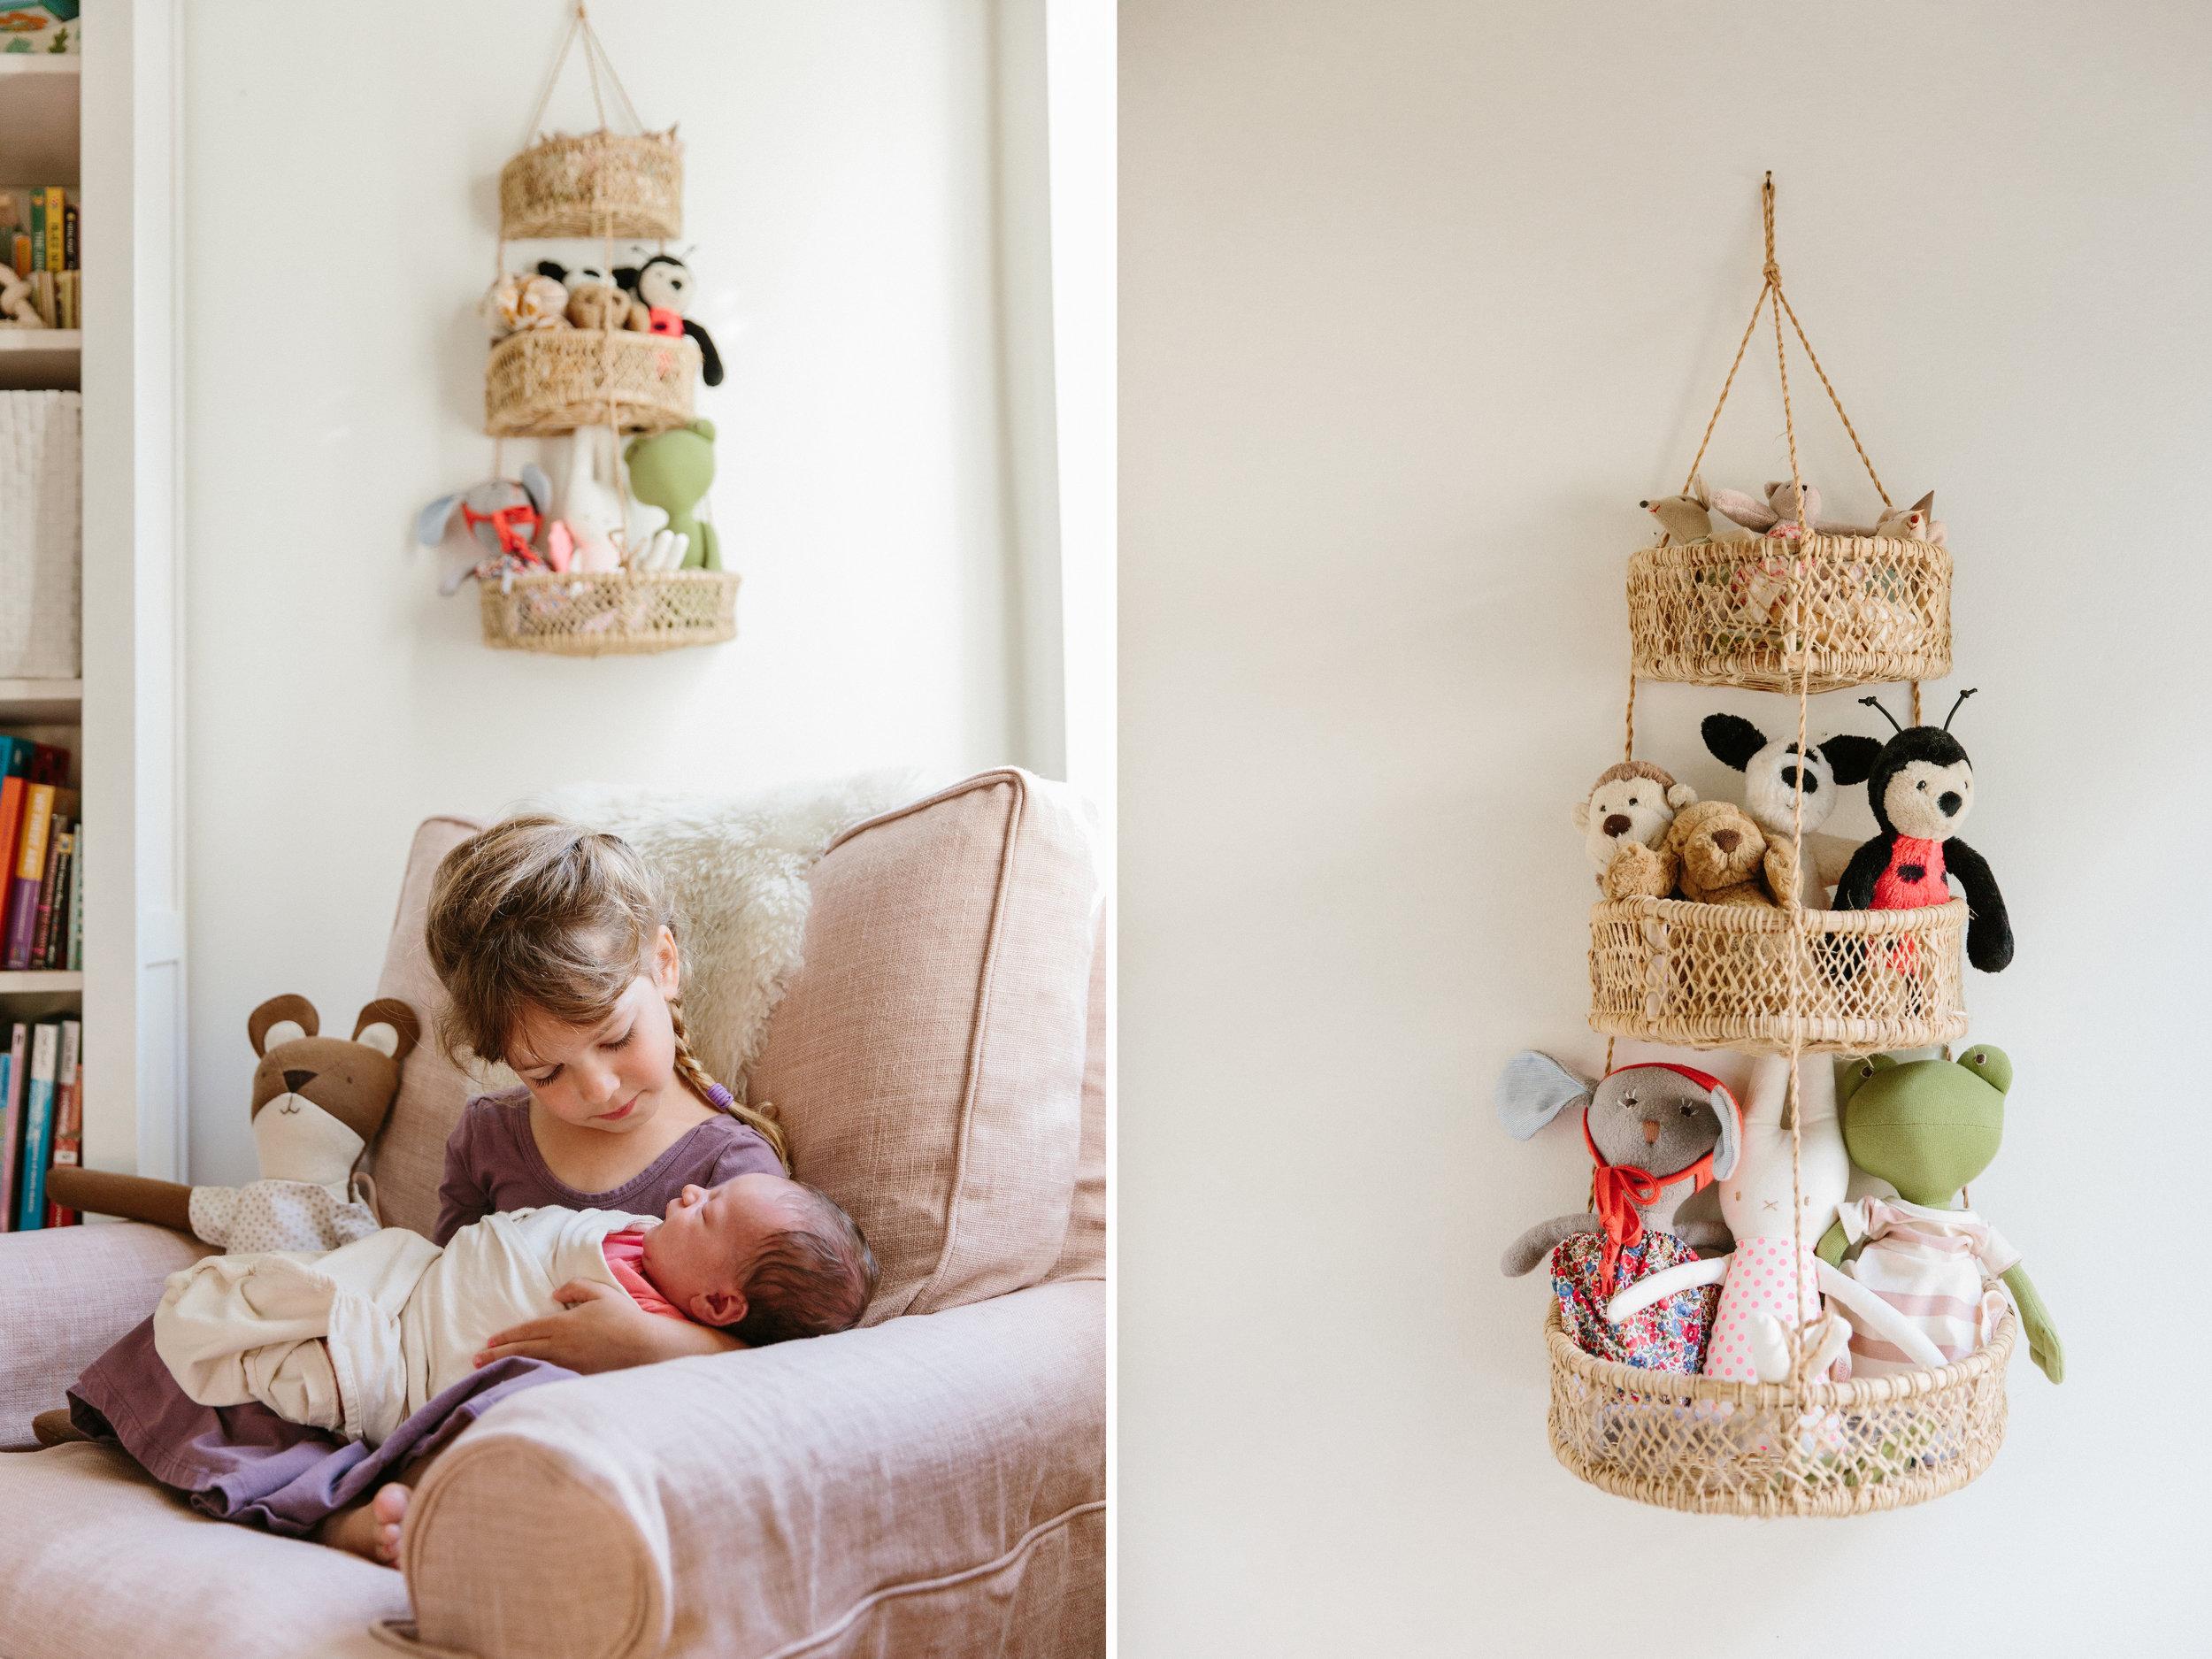 childrens-nursery_girls-shared-room_nicki-sebastian-interior-photography_los-angeles_2.jpg